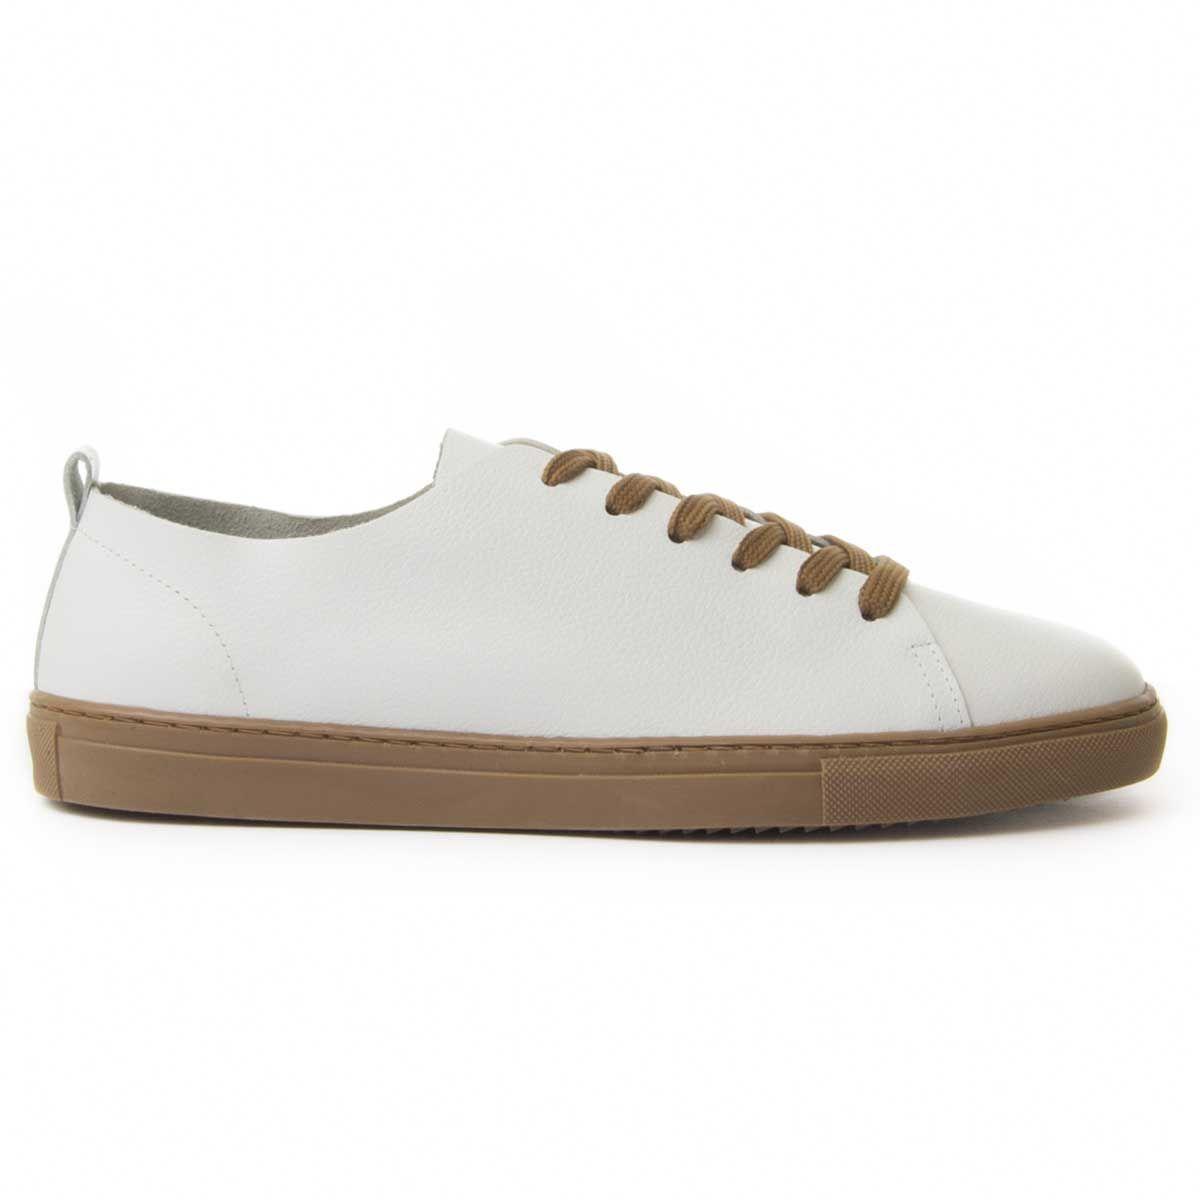 Montevita Leather Sneaker in White